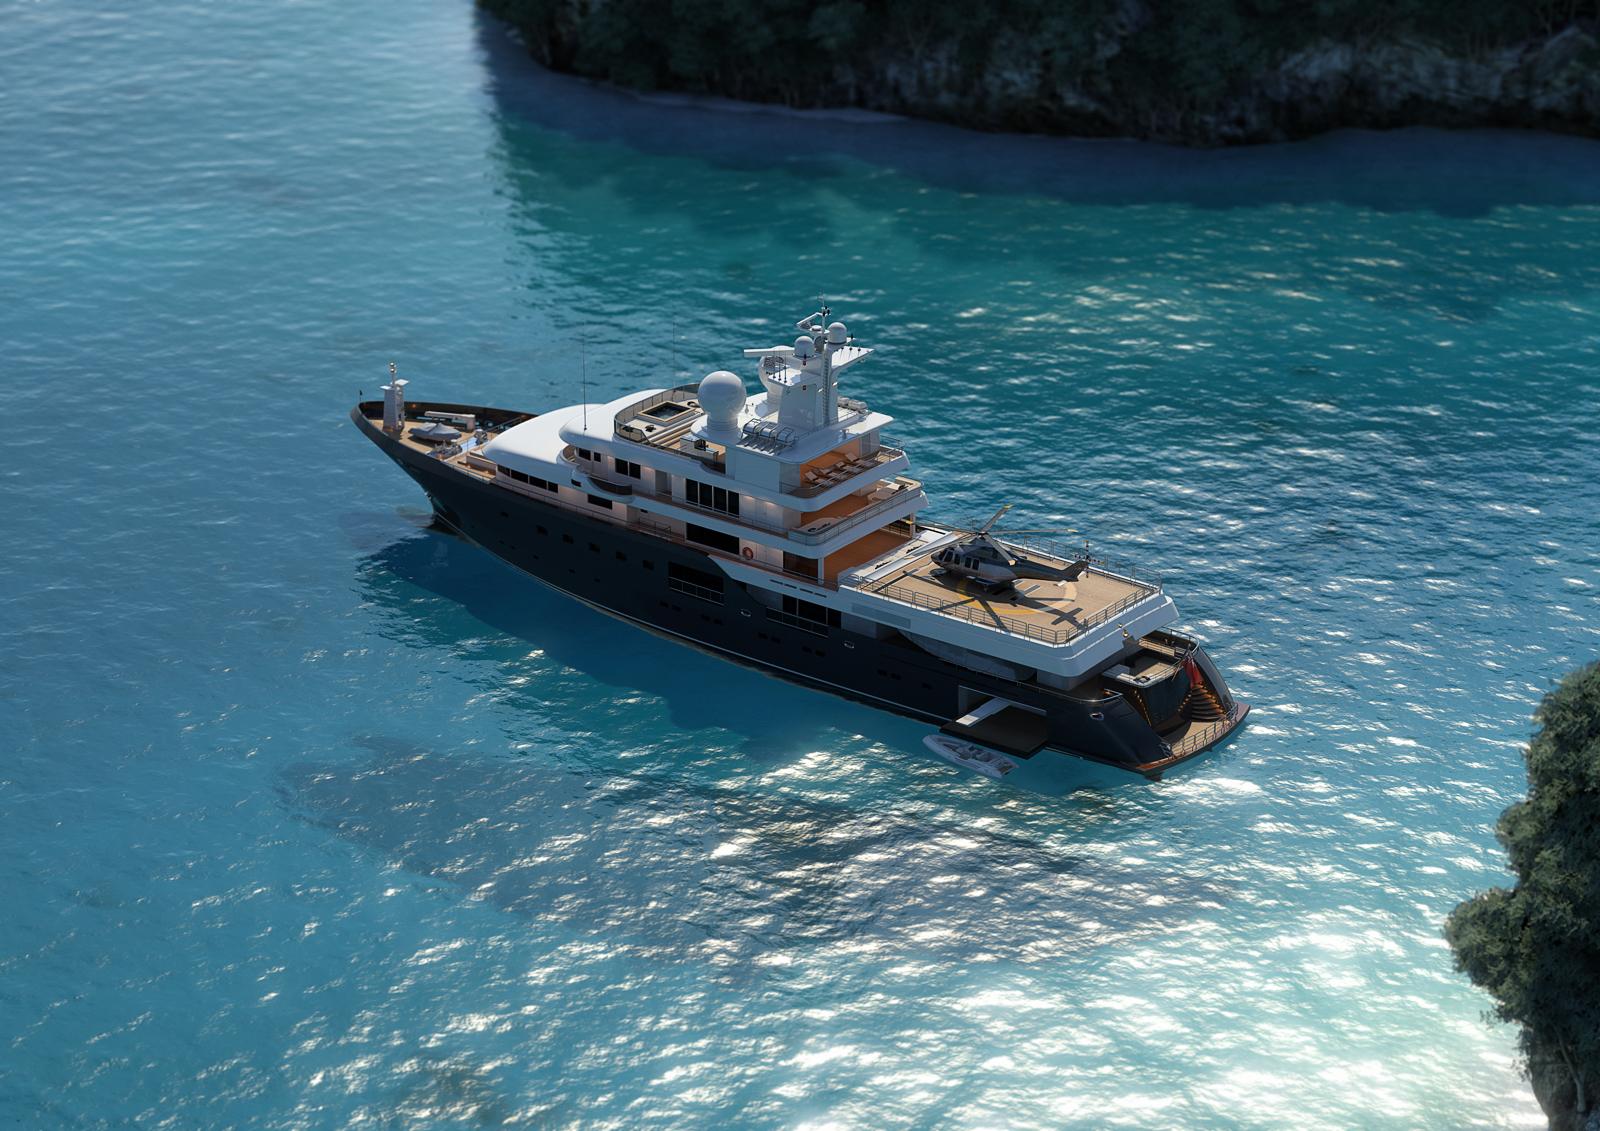 Yacht Planet Nine Admiral Nca Carrara Charterworld Luxury